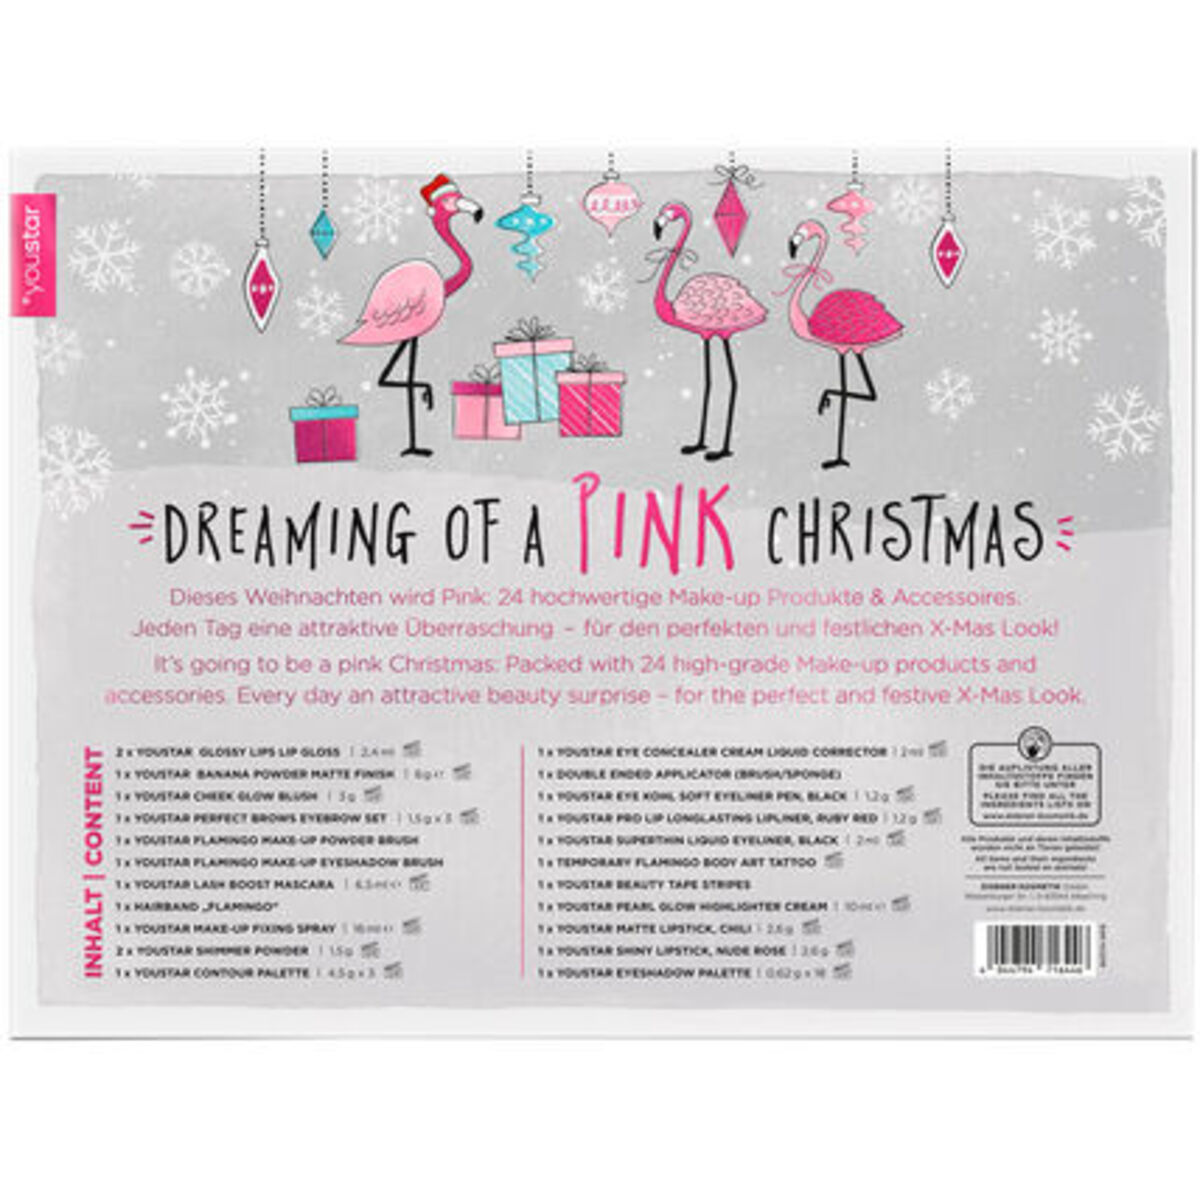 Bild 1 von youstar Adventskalender Dreaming of a Pink Christmas 2018